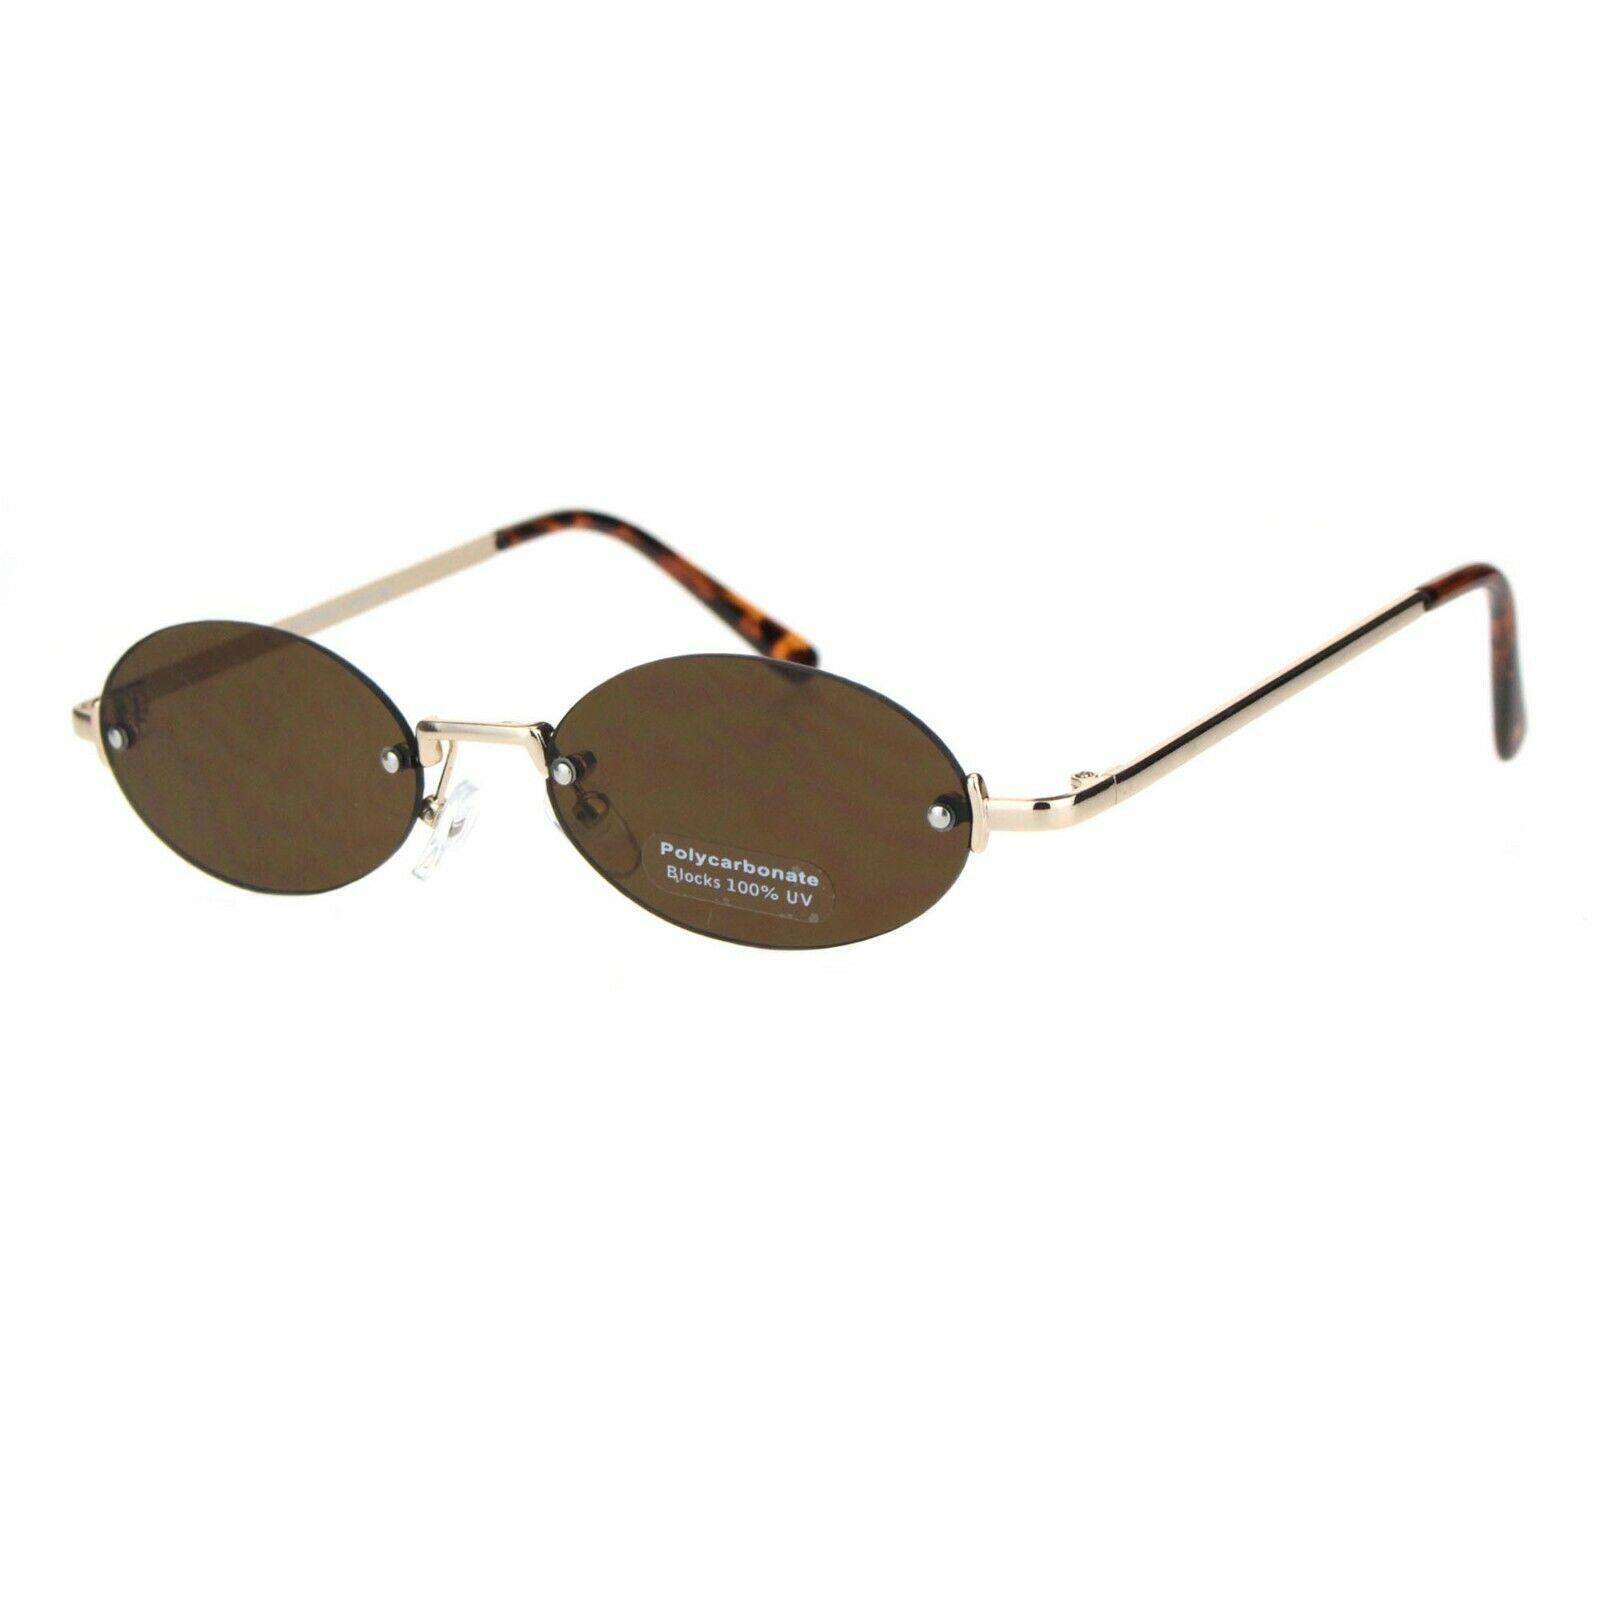 Rimless Oval Shape Sunglasses Unisex Trendy Fashion Metal Frame UV 400